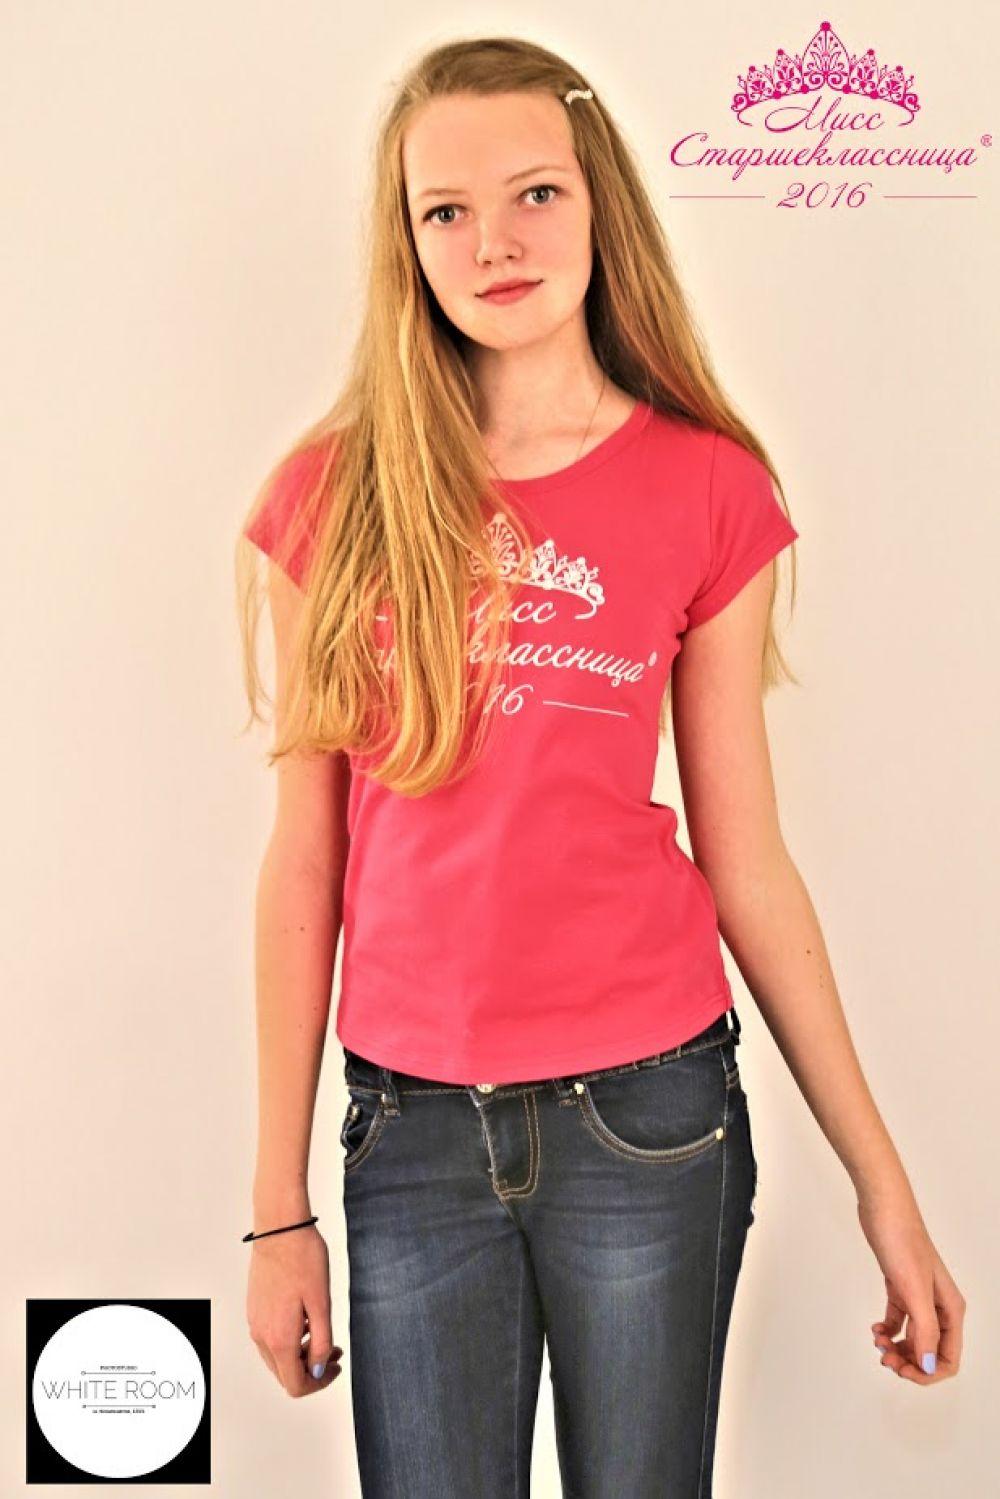 Дарья Мамашева, школа №120, 14 лет.